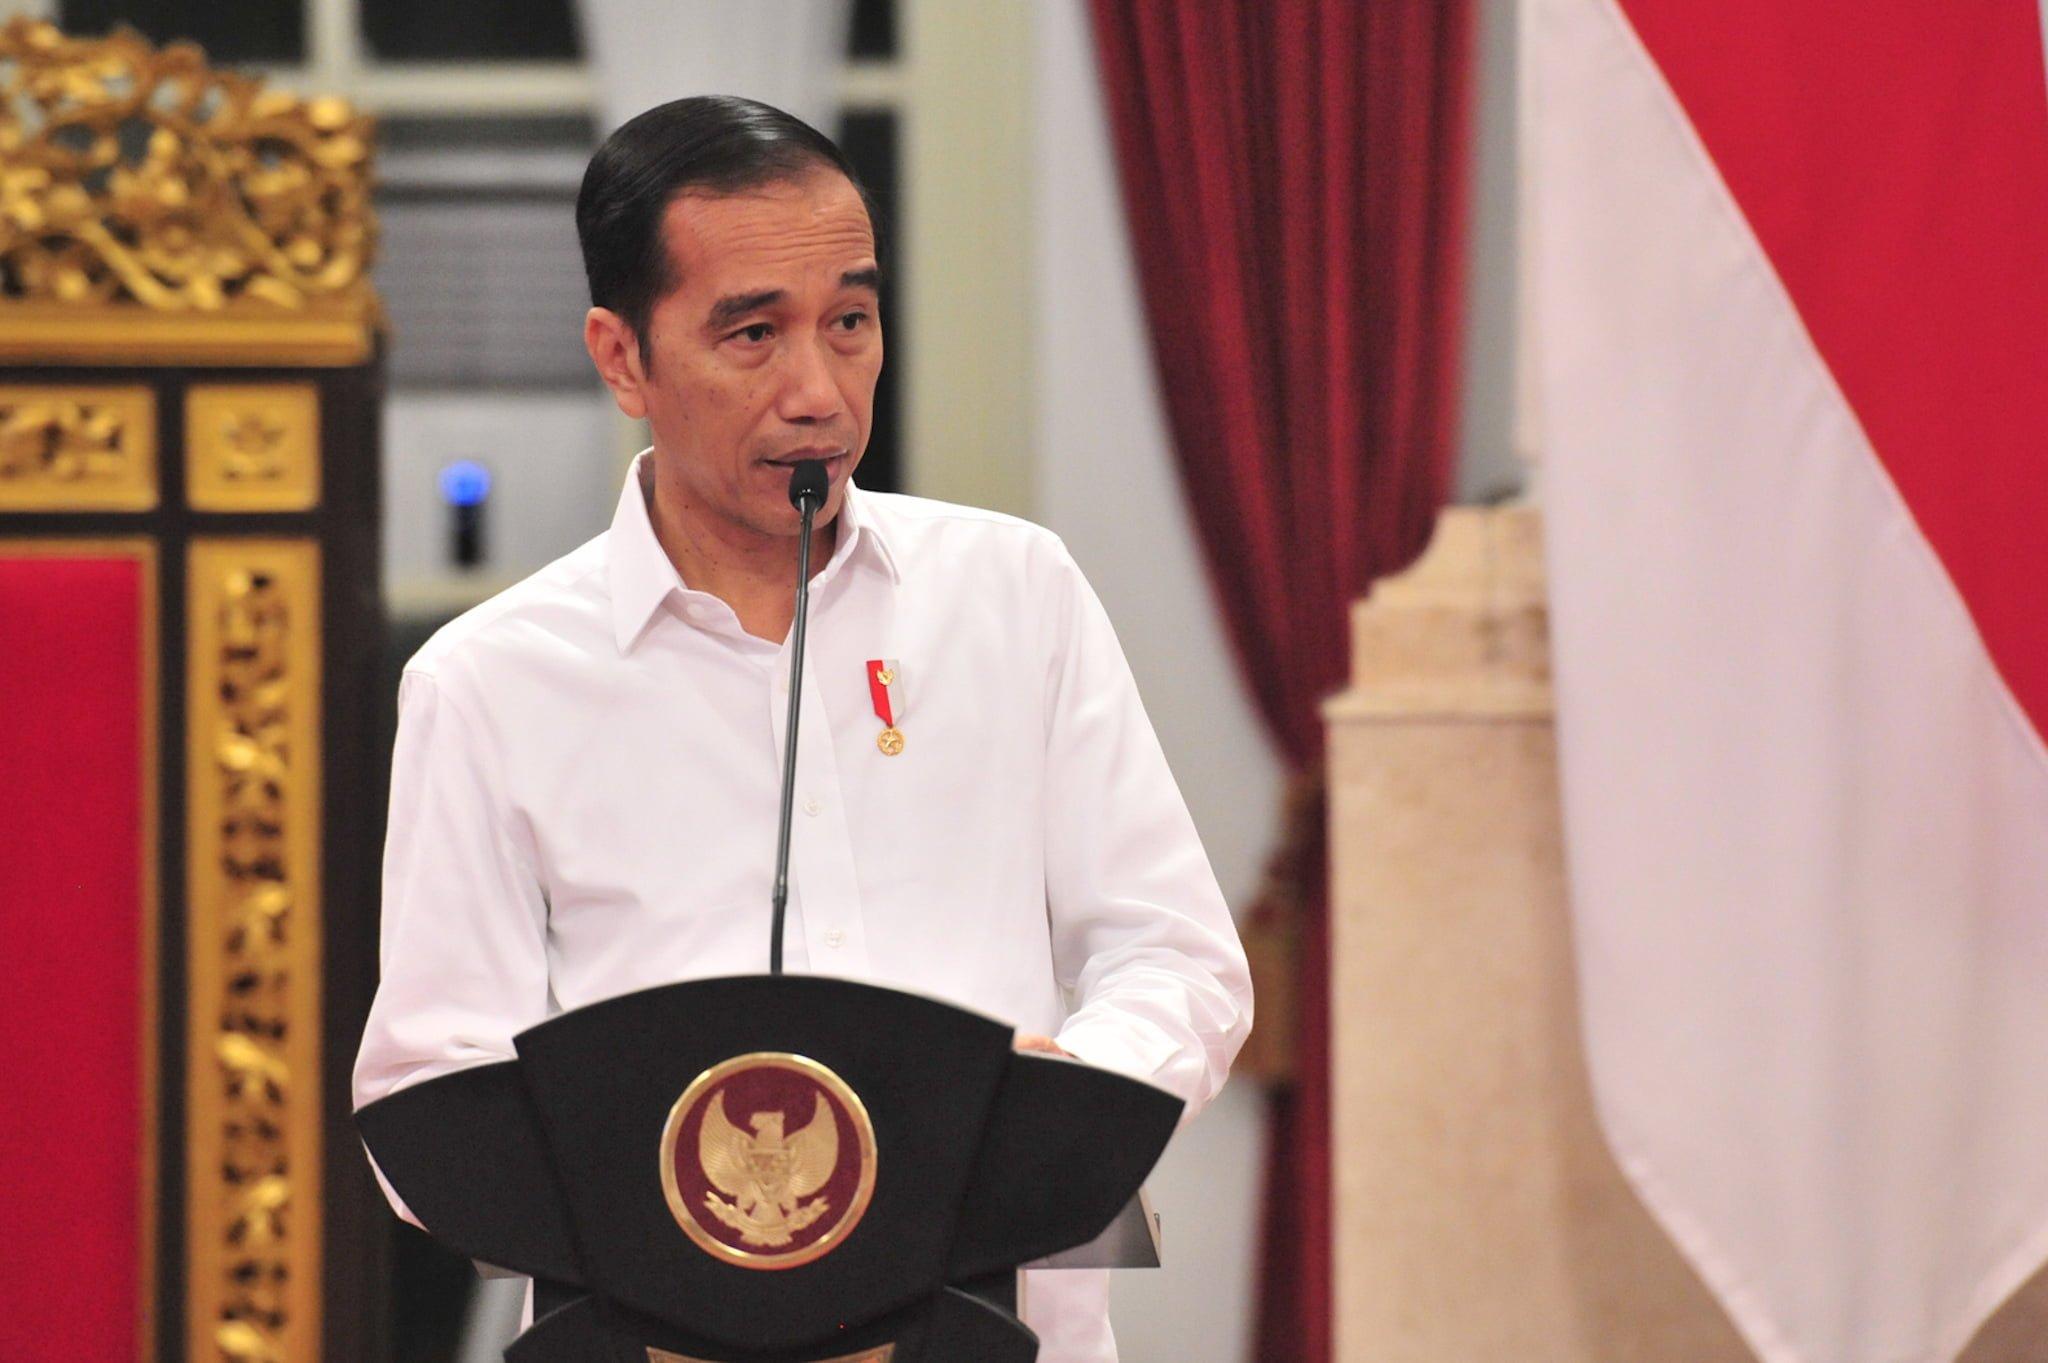 Soal Natuna, Presiden Jokowi Tegaskan Tidak Ada Tawar-Menawar Soal Kedaulatan 113